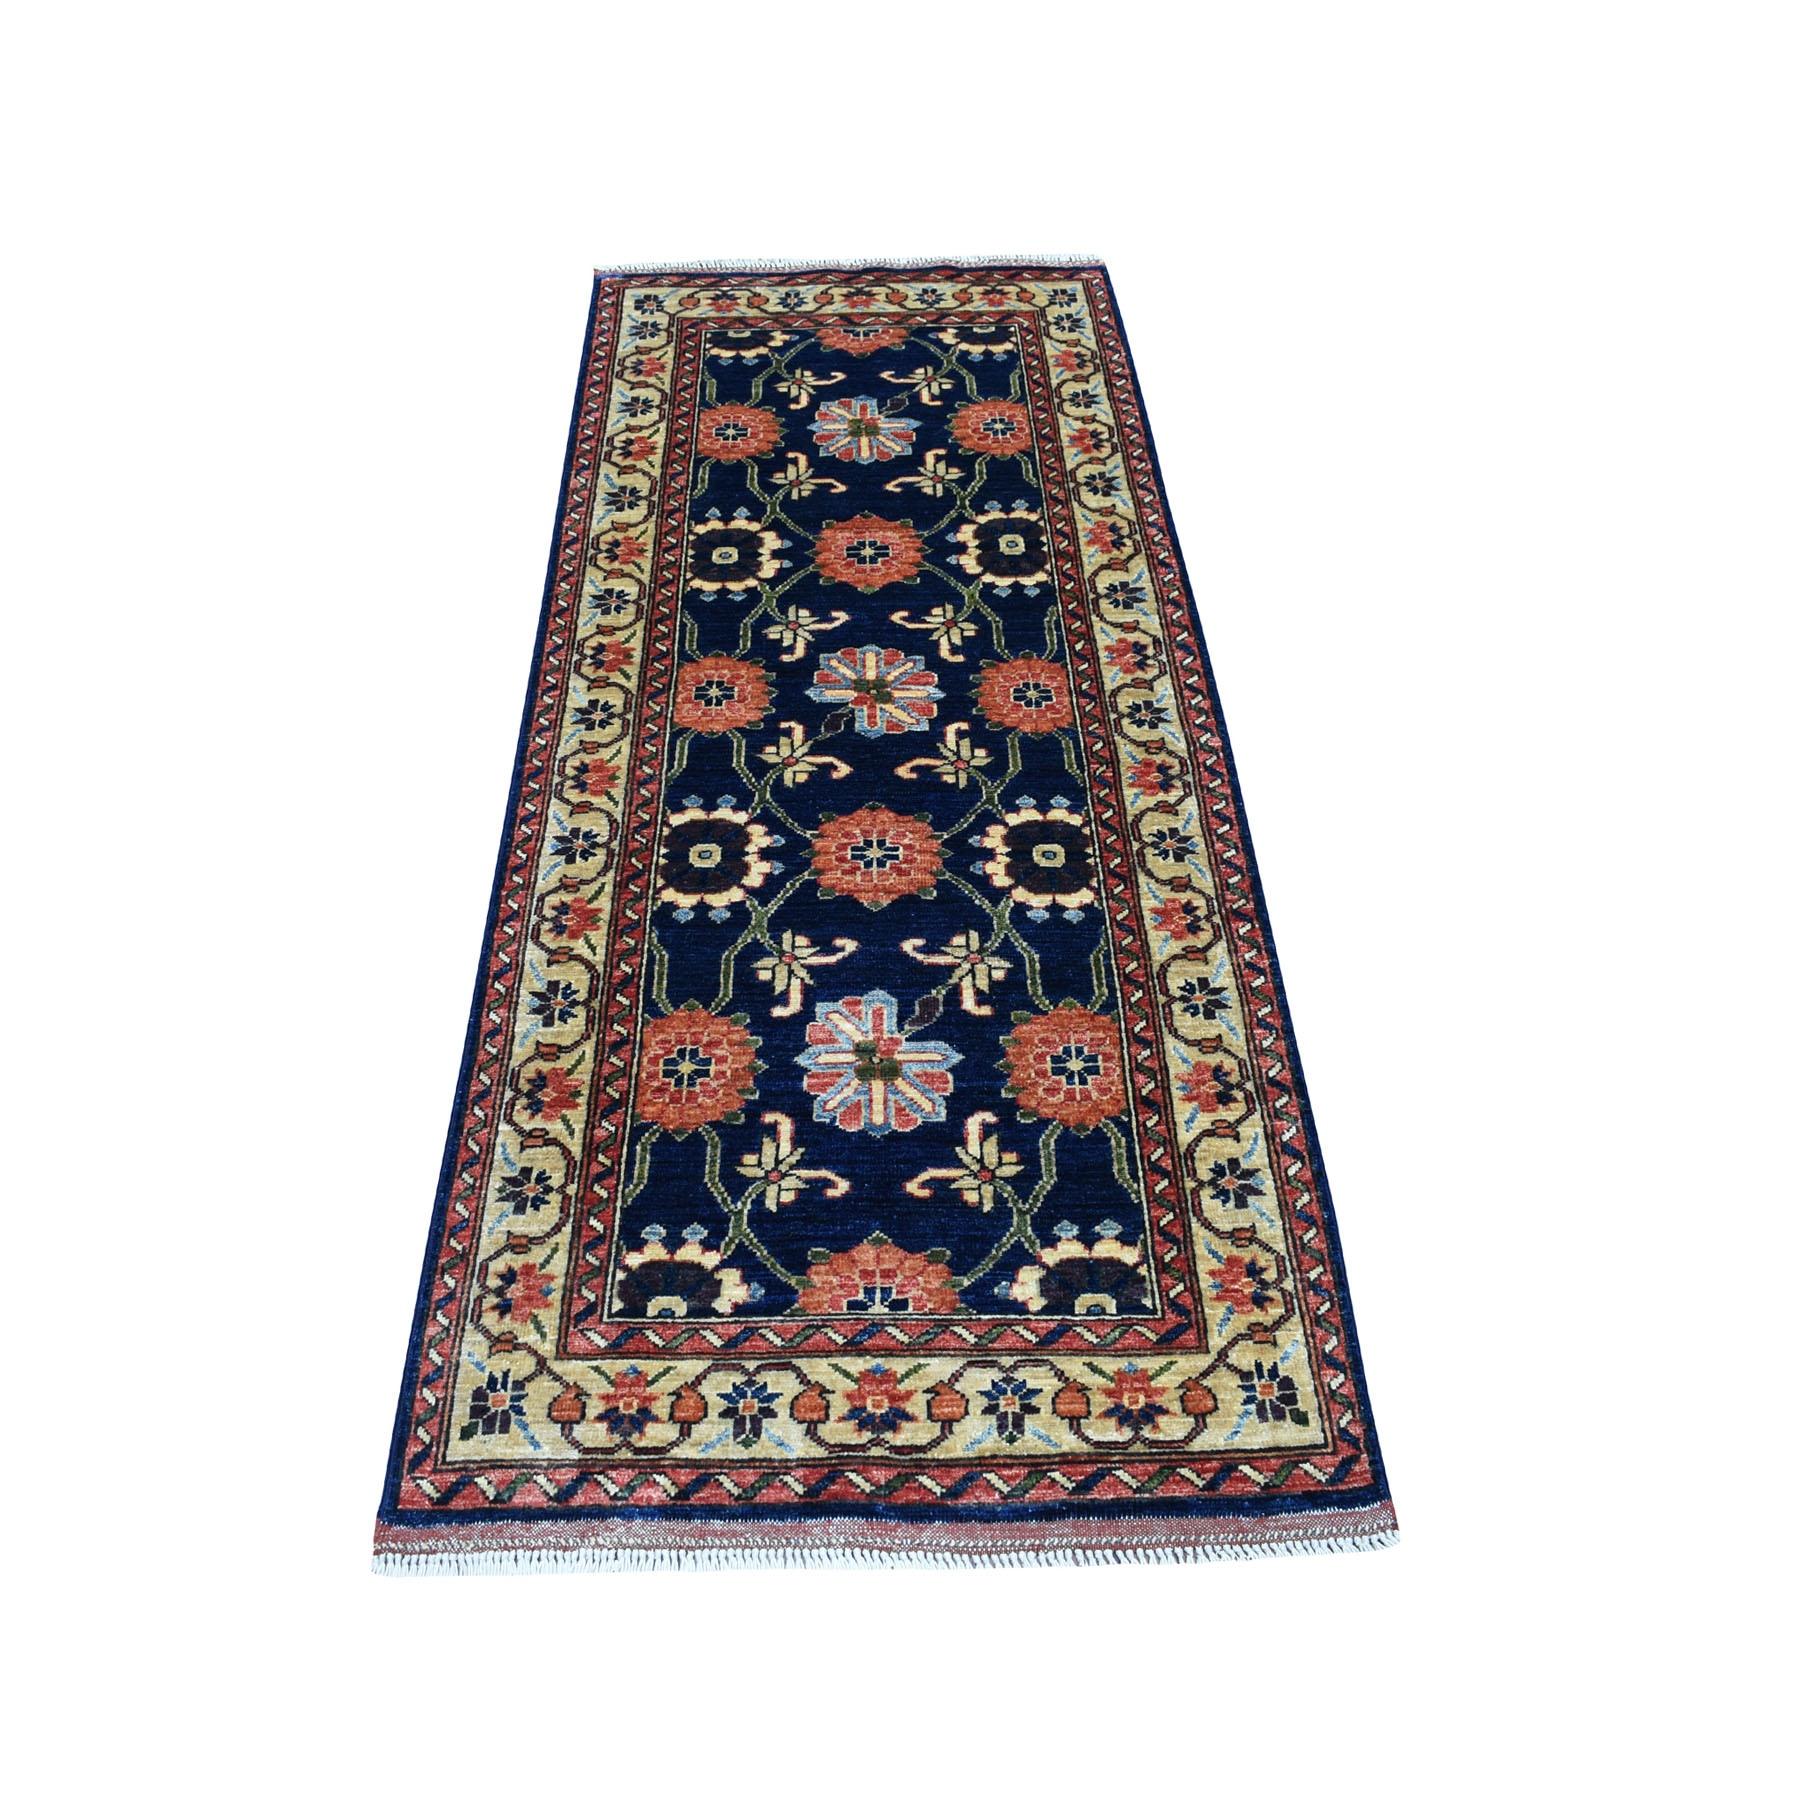 "2'8""X6'5"" Blue Afghan Ersari Runner Tribal Design Pure Wool Hand Knotted Oriental Rug moaec096"